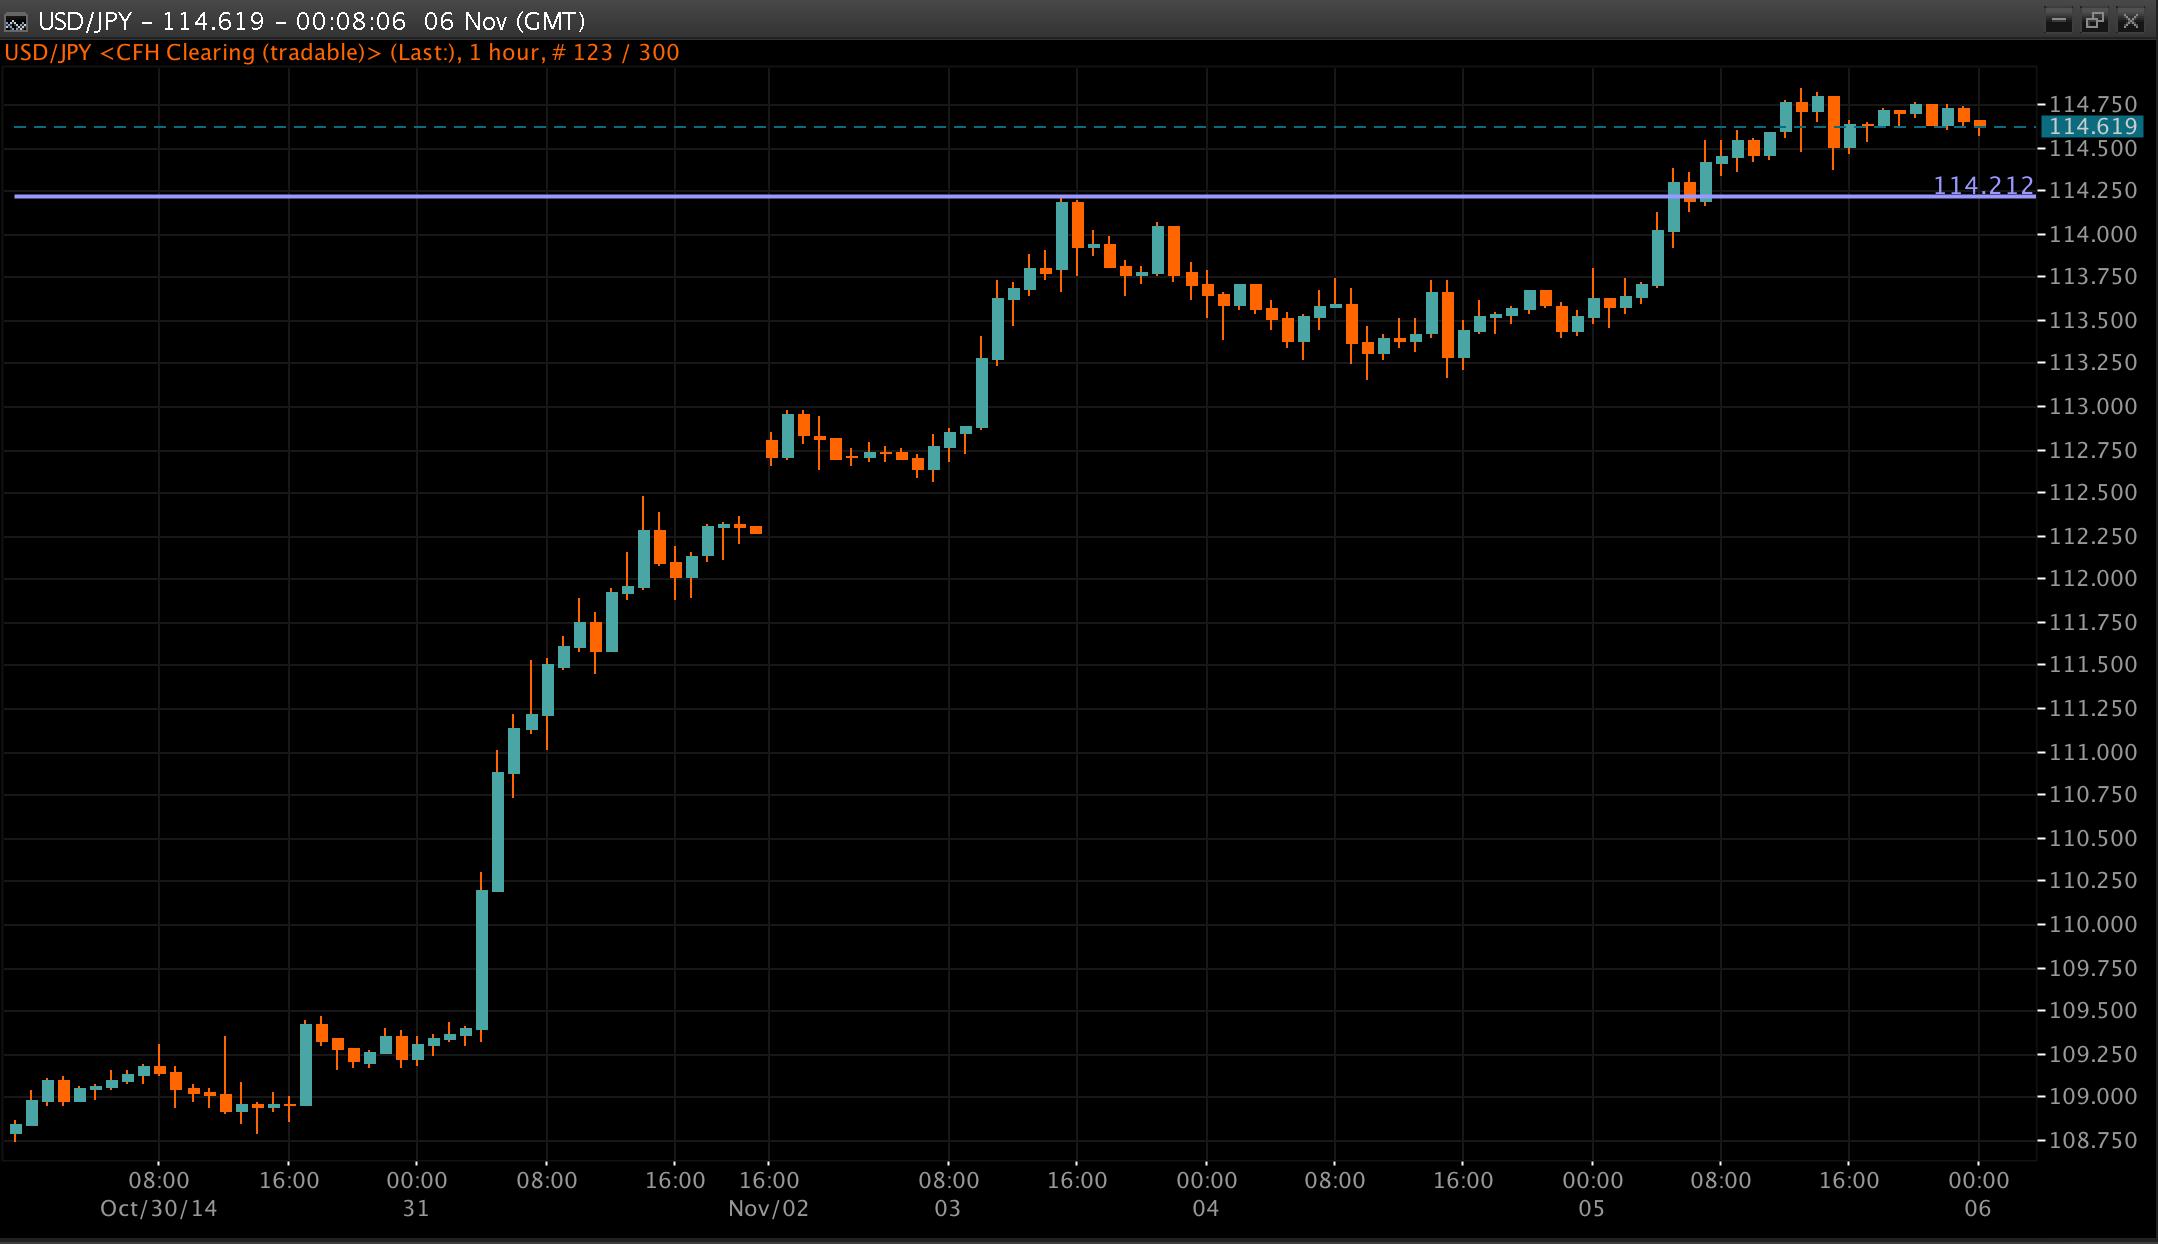 USD/JPY Chart 06 Nov 2014